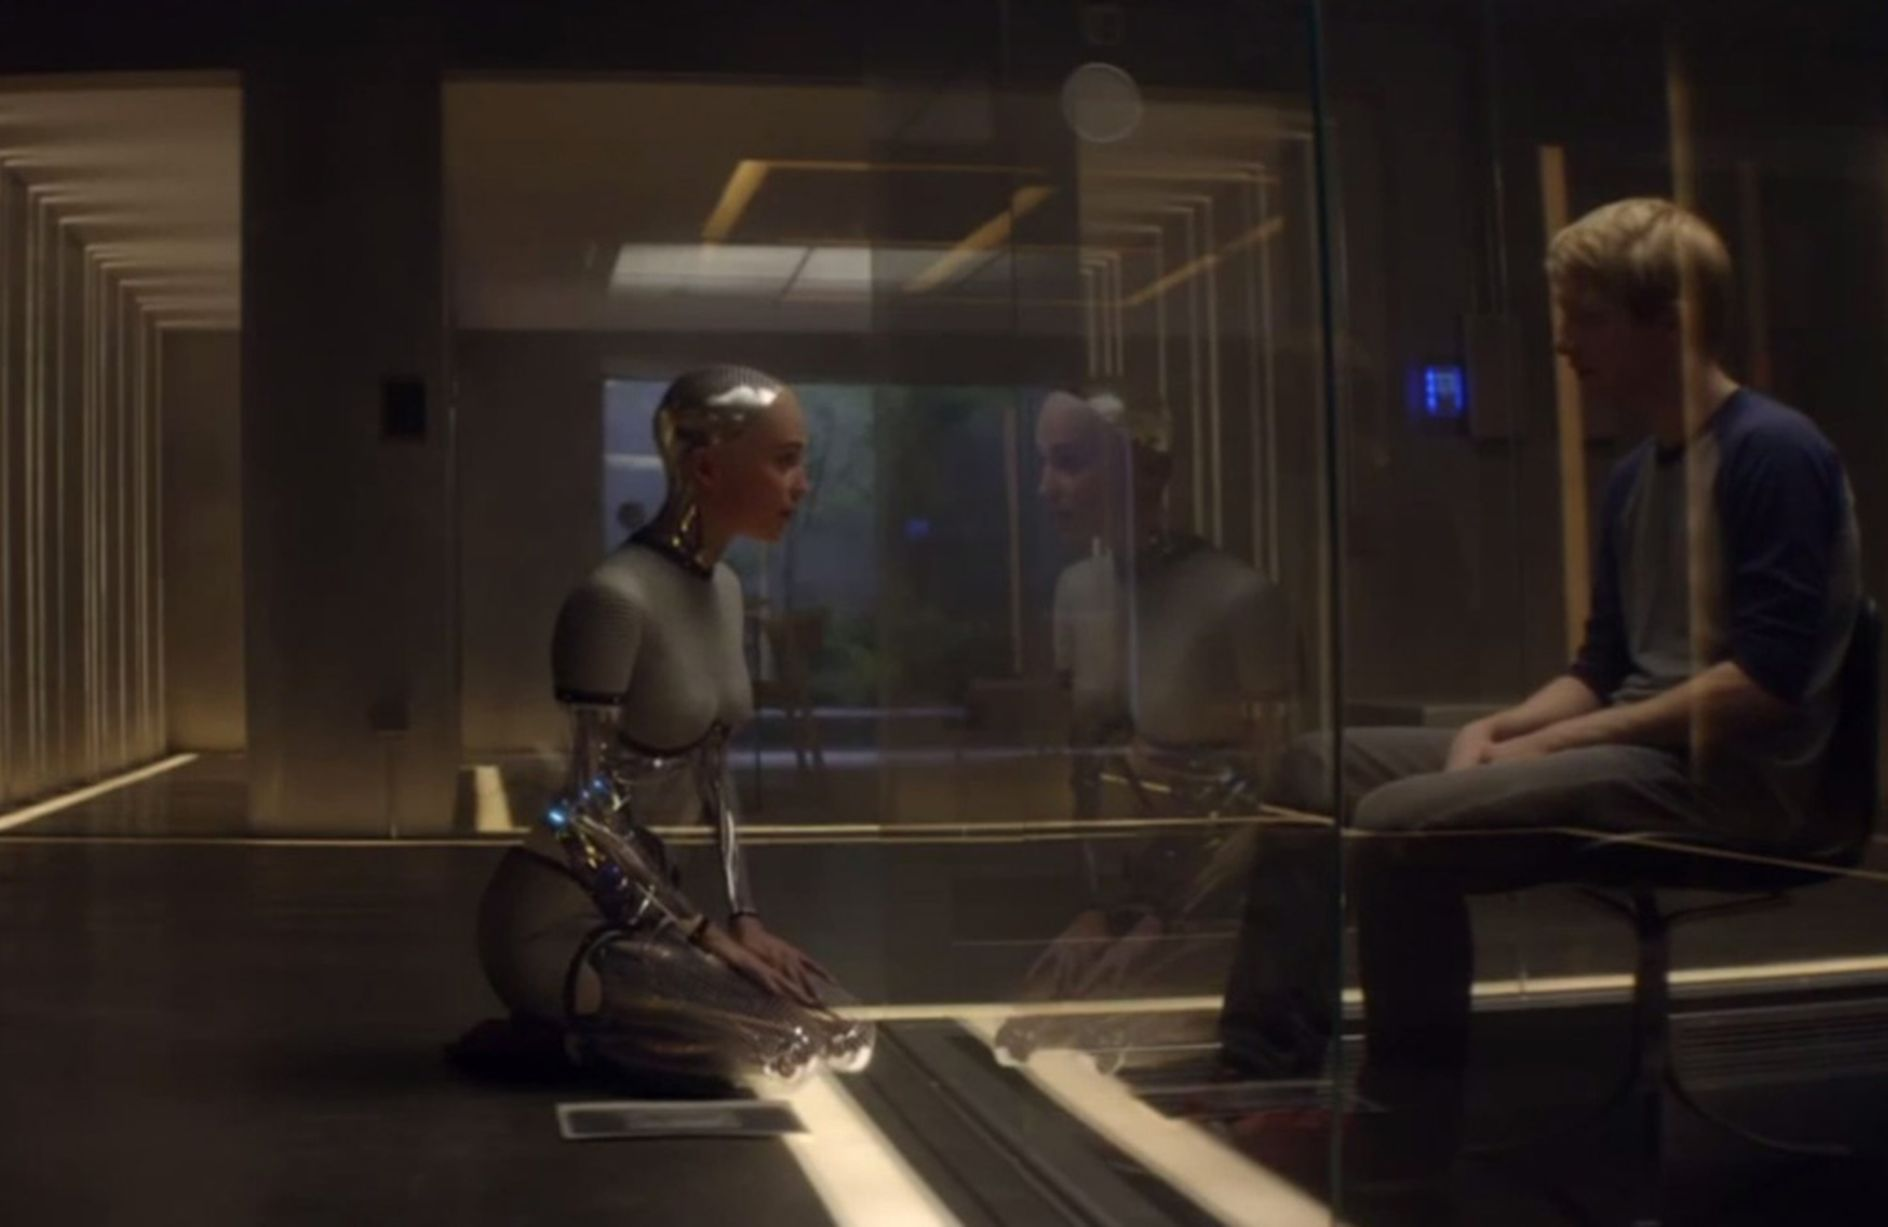 Men in 'Ex Machina' test intelligence of drop-dead cyborg